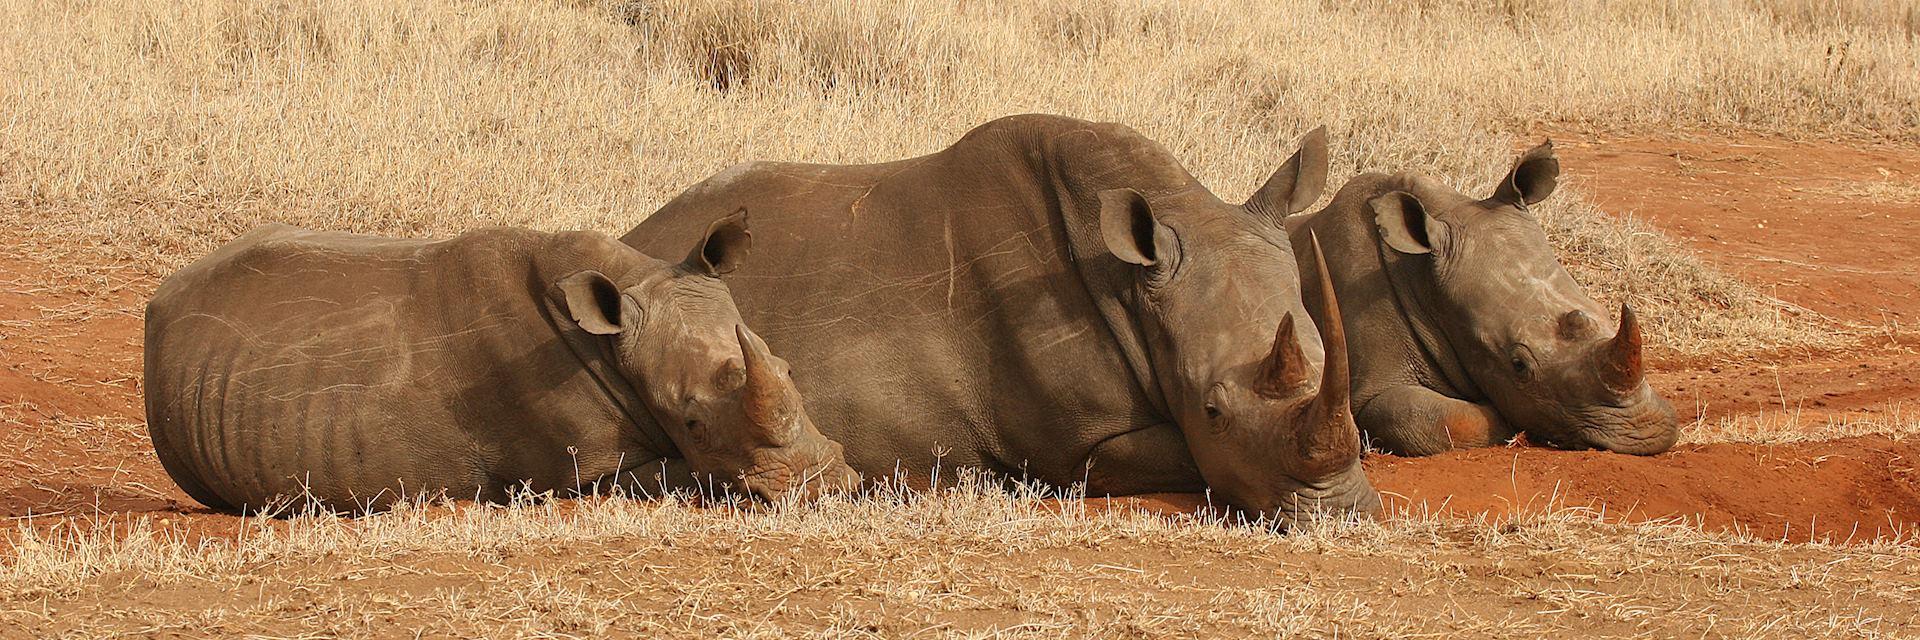 Rhino, Lewa Wilderness Conservancy